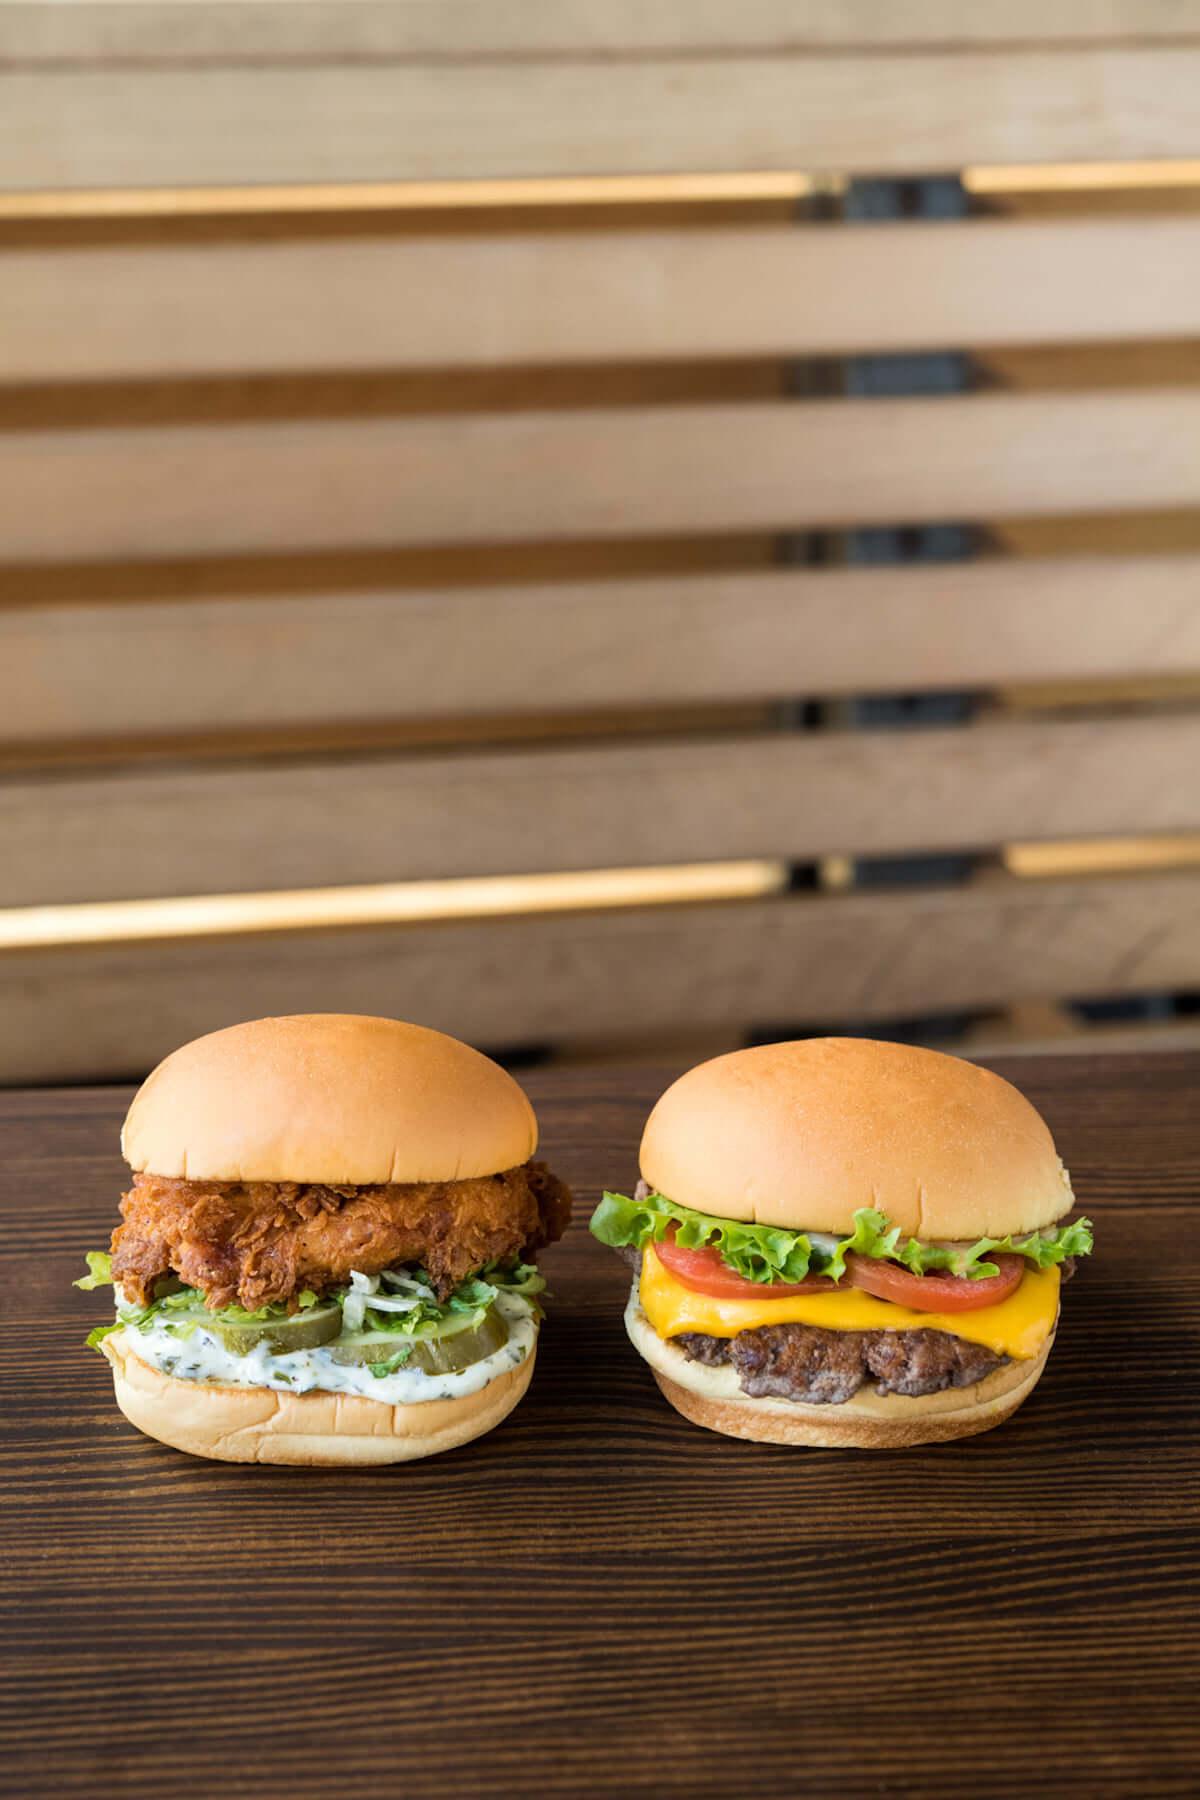 Shake Shack日本上陸3周年記念!世界で人気のチキンバーガー「チキンシャック」が日本上陸! food181029_shakeshack_3-1200x1800